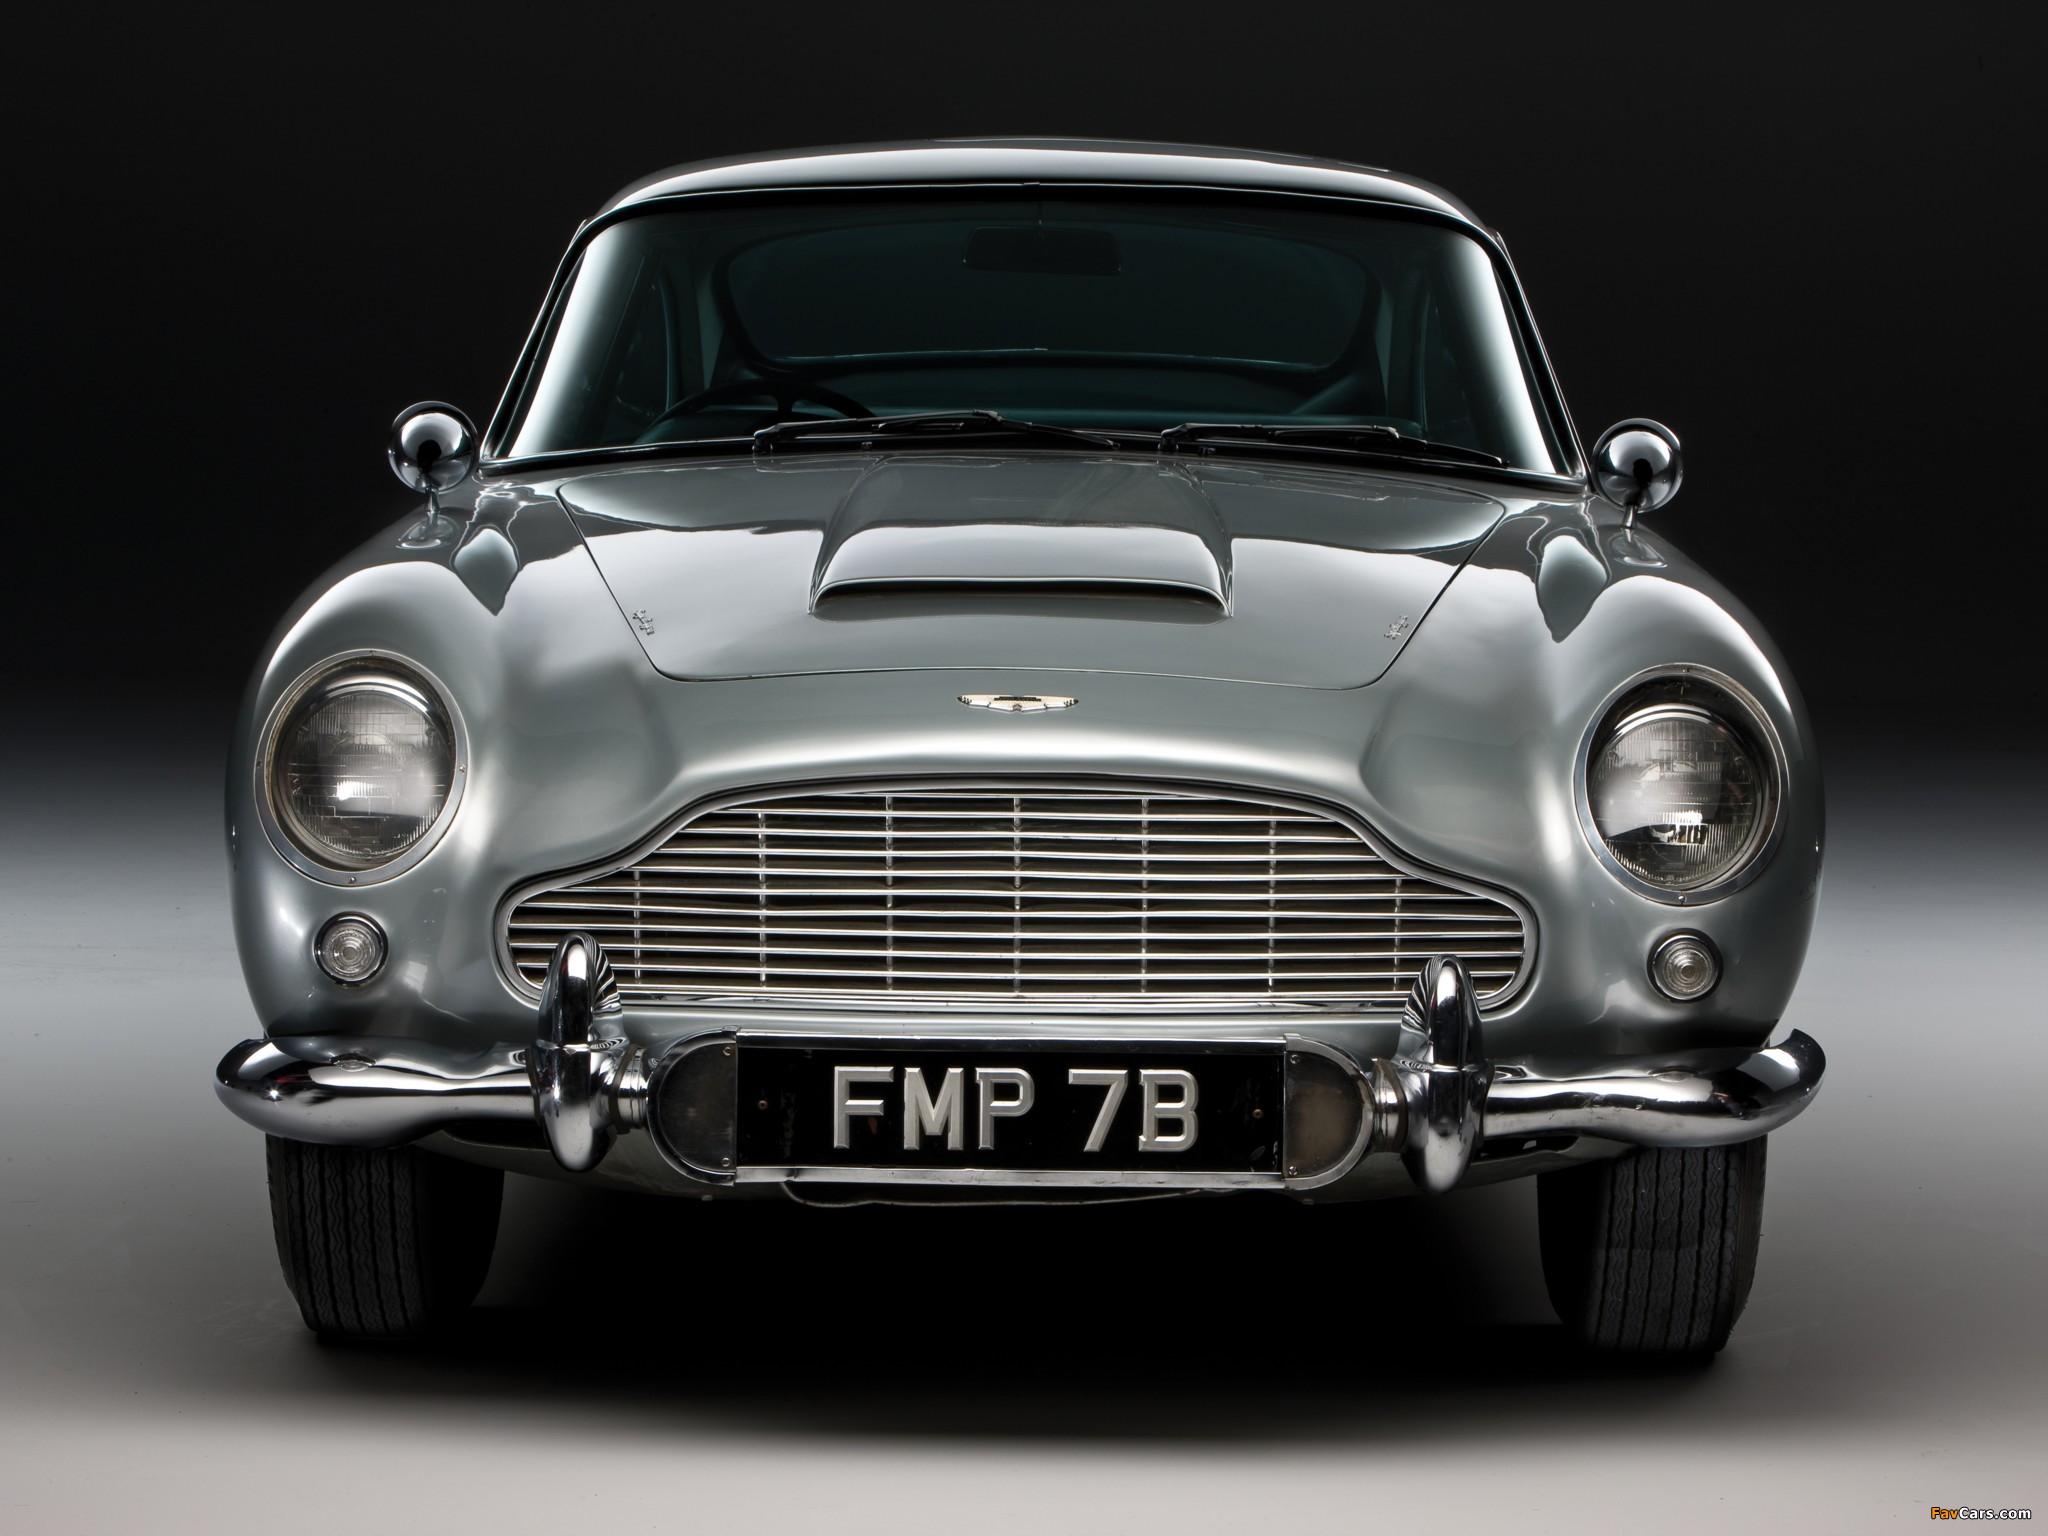 Wallpapers of Aston Martin DB5 James Bond Edition 1964 2048 x 1536 2048x1536